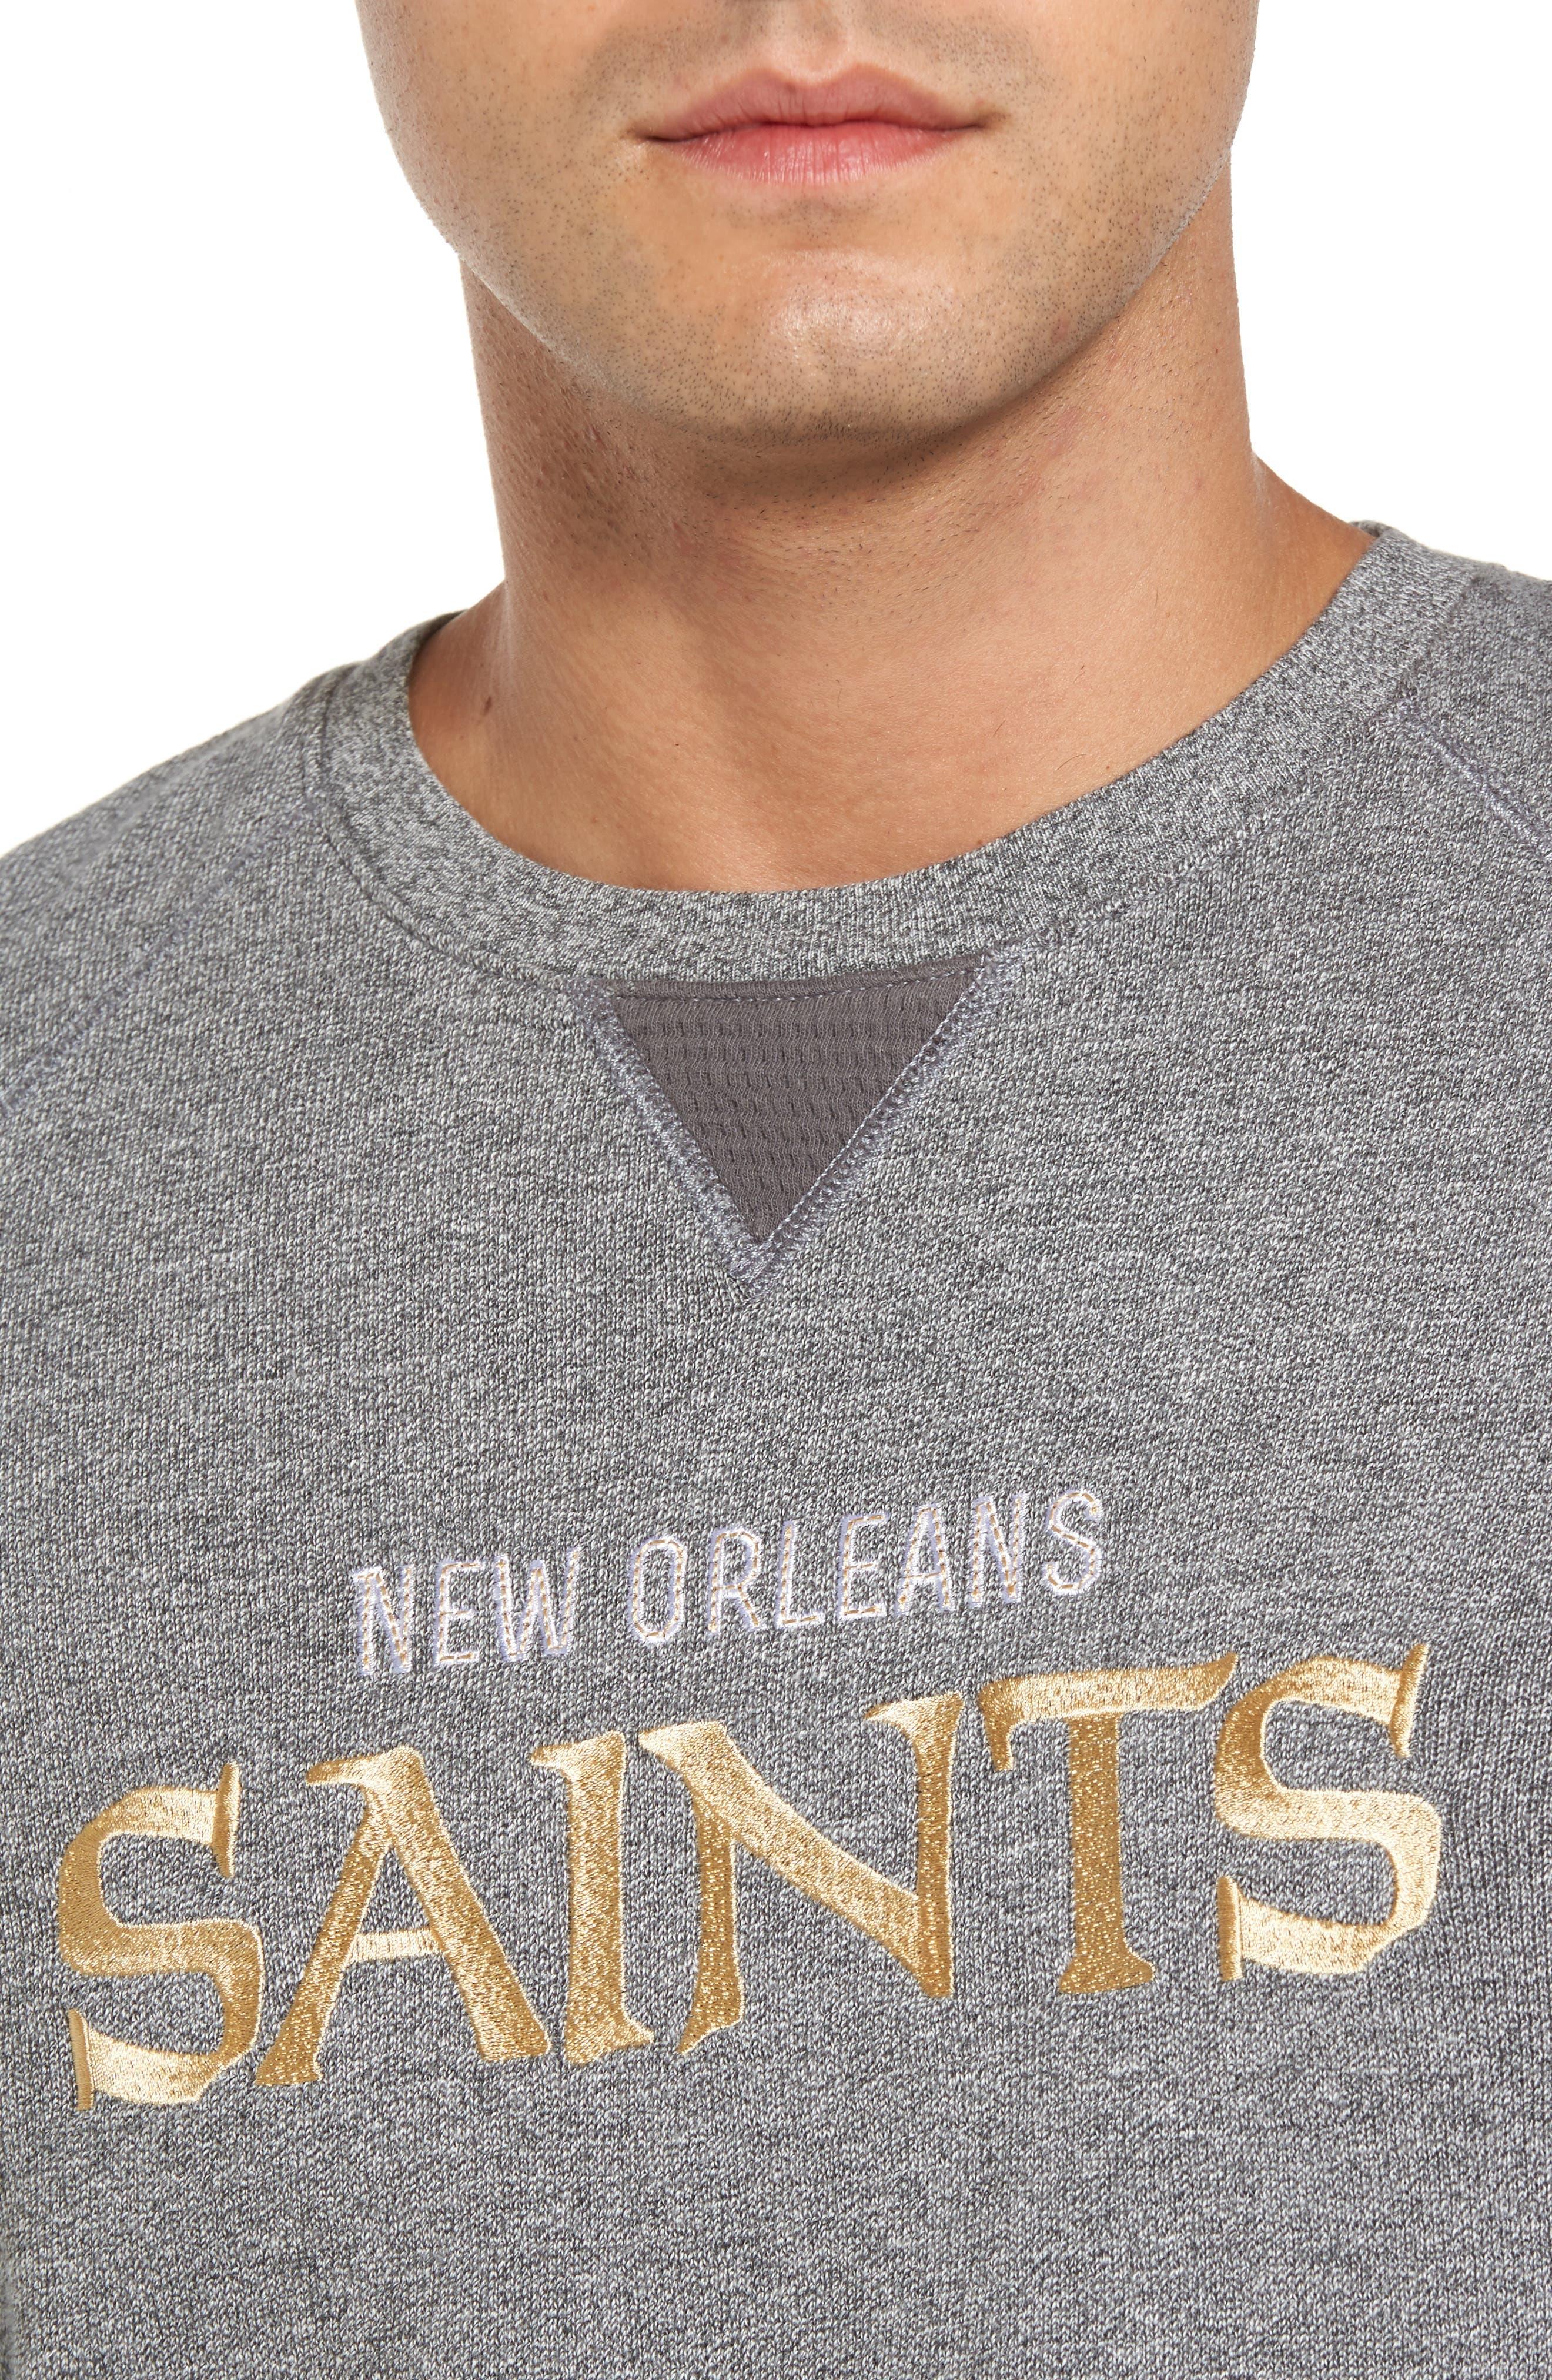 NFL Stitch of Liberty Embroidered Crewneck Sweatshirt,                             Alternate thumbnail 117, color,